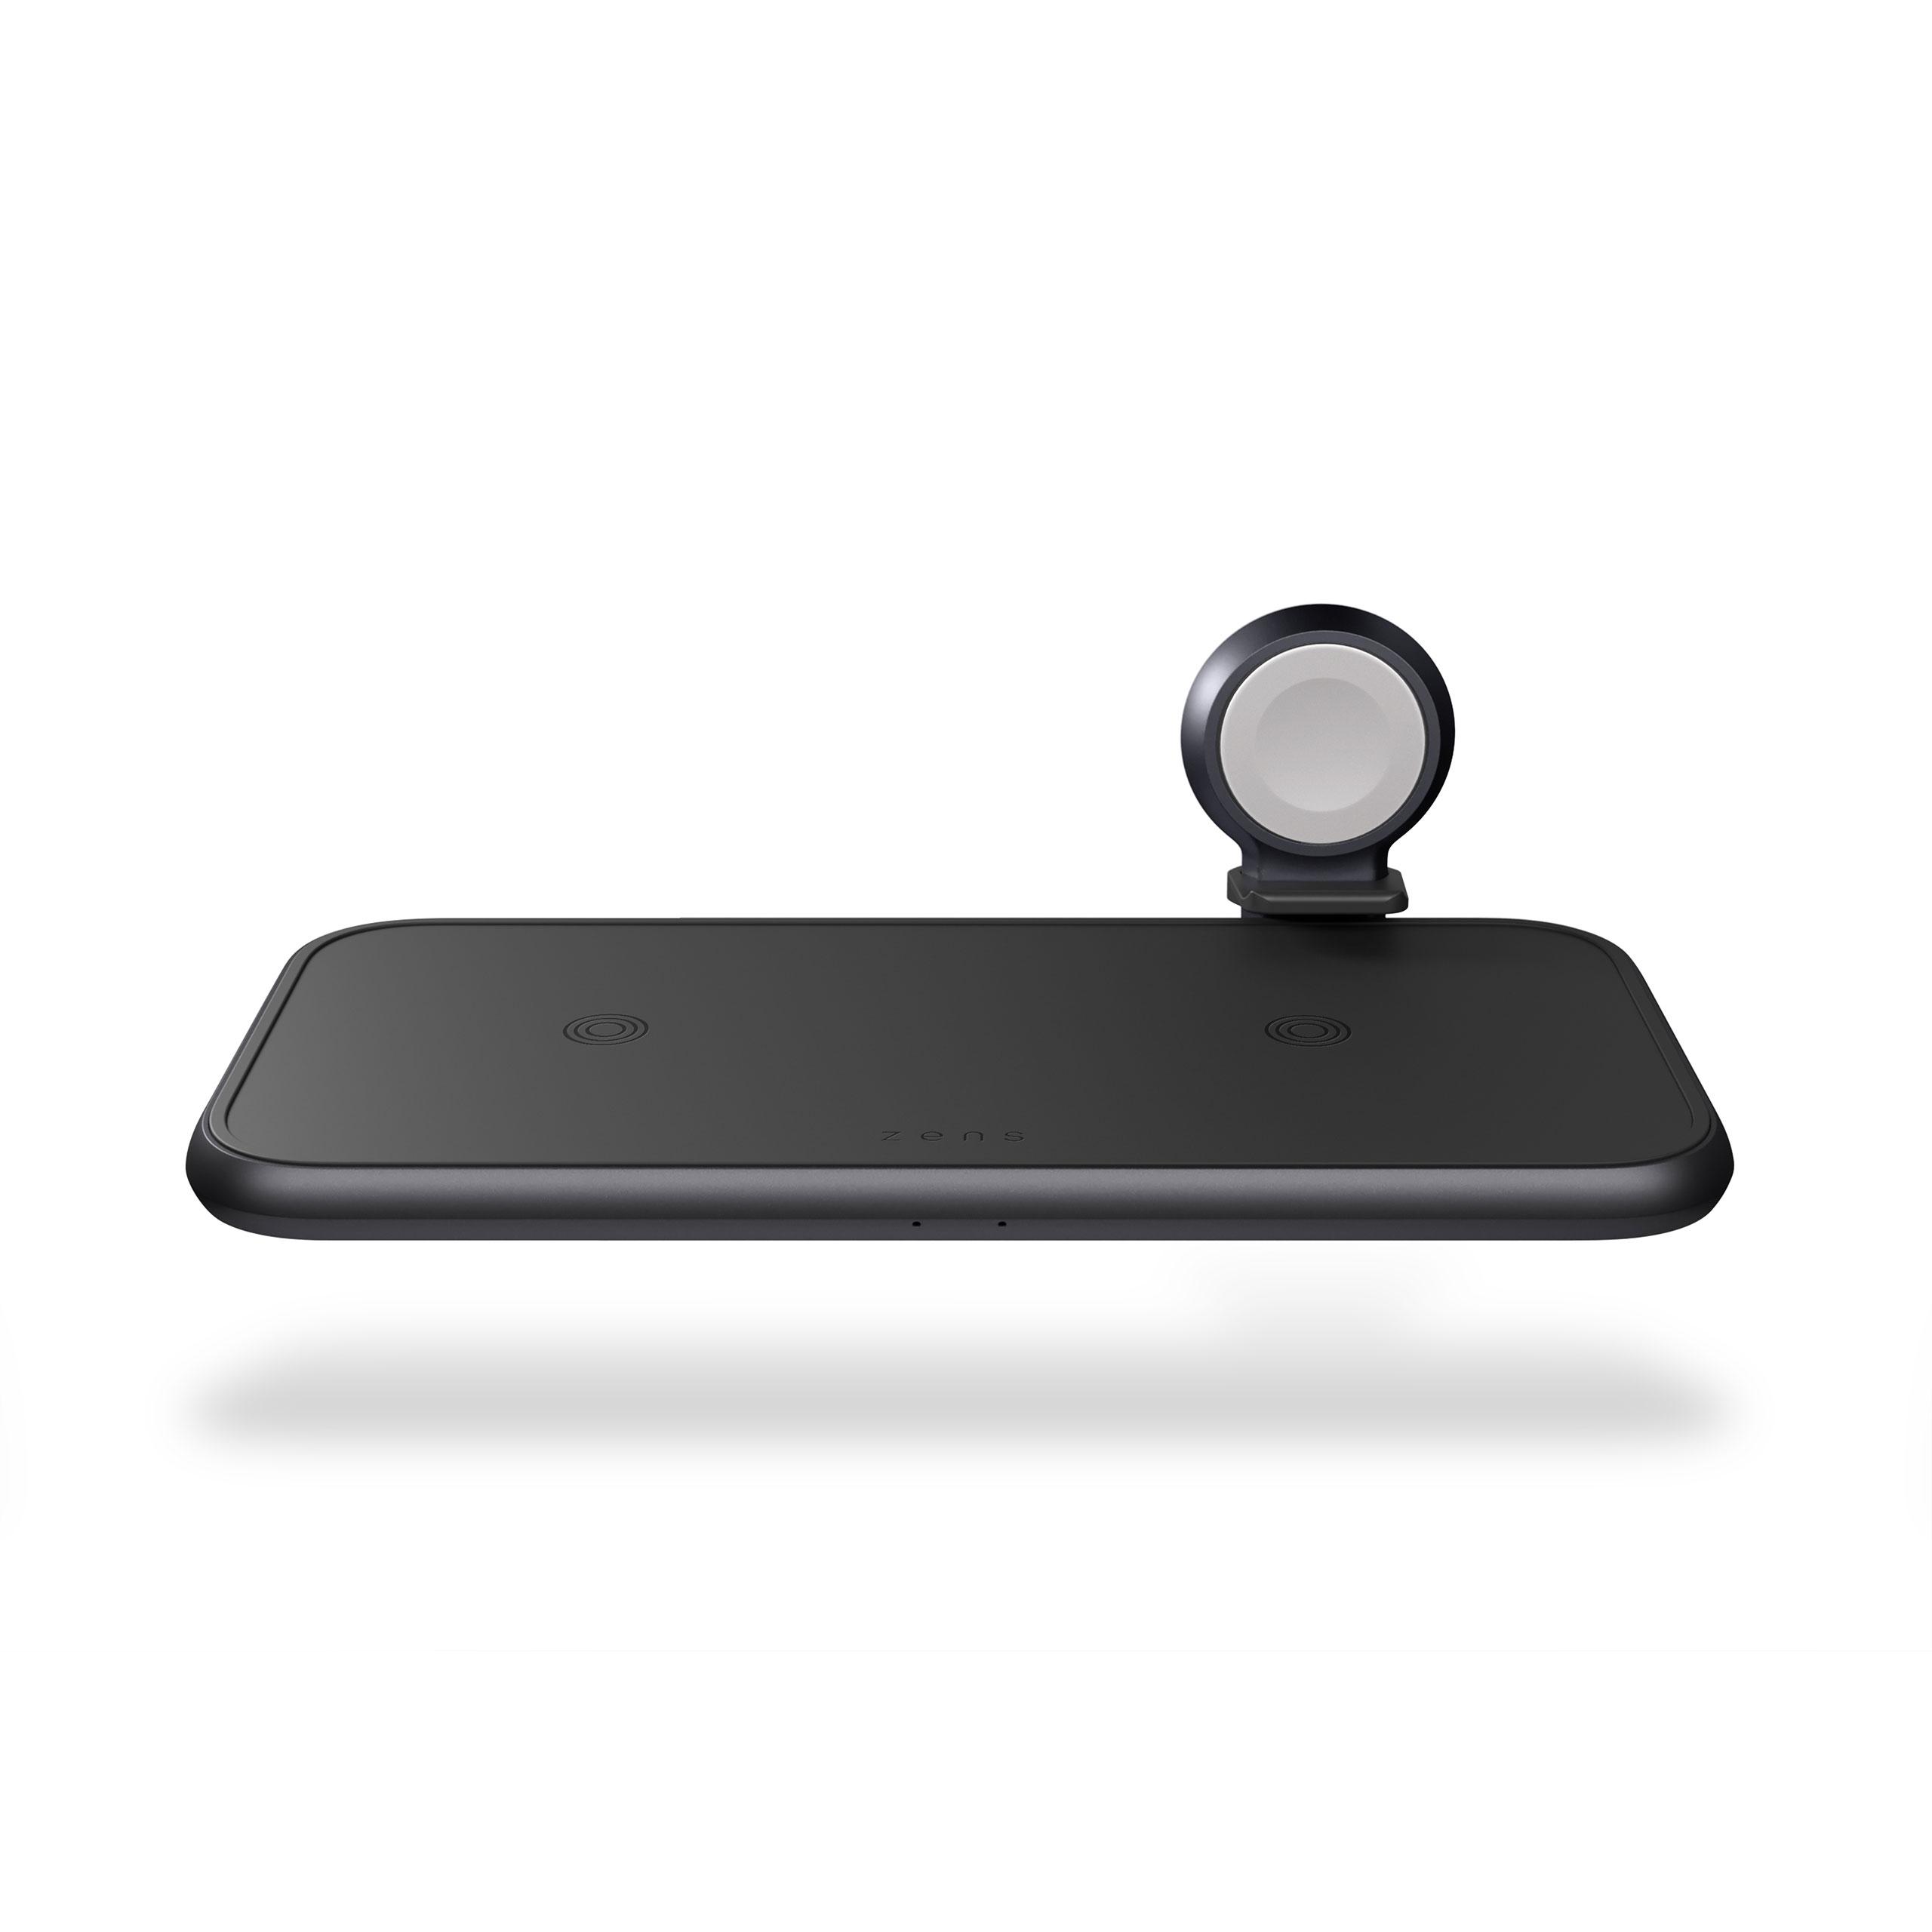 ZEDC14B - Zens 4-in-1 Wireless Charger Front Top View